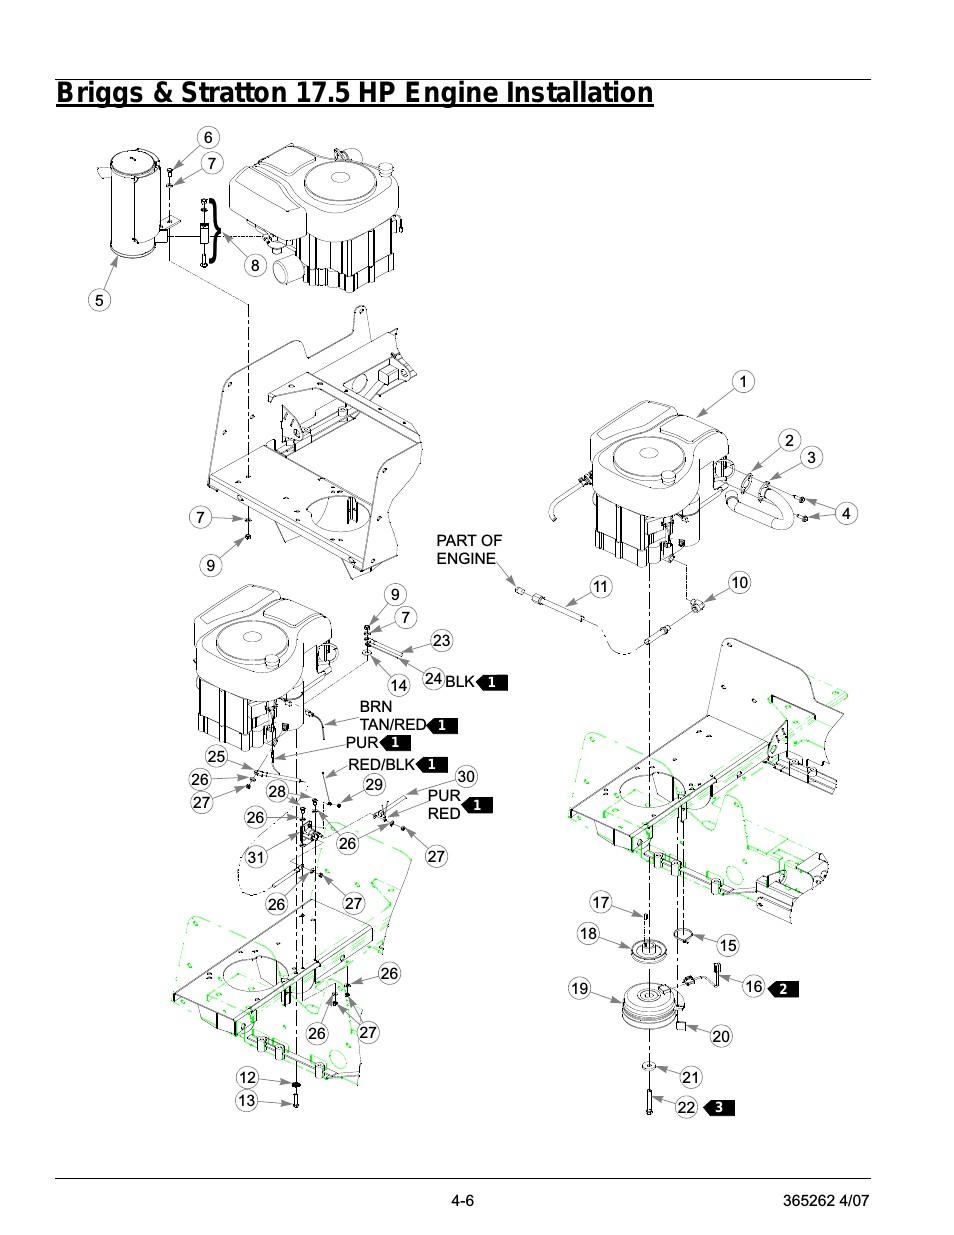 Briggs 17.5 Hp Engine Manual Briggs & Stratton 17 5 Hp Engine Installation Briggs & Stratton 17 5 Hp Engine Installation 6 Of Briggs 17.5 Hp Engine Manual